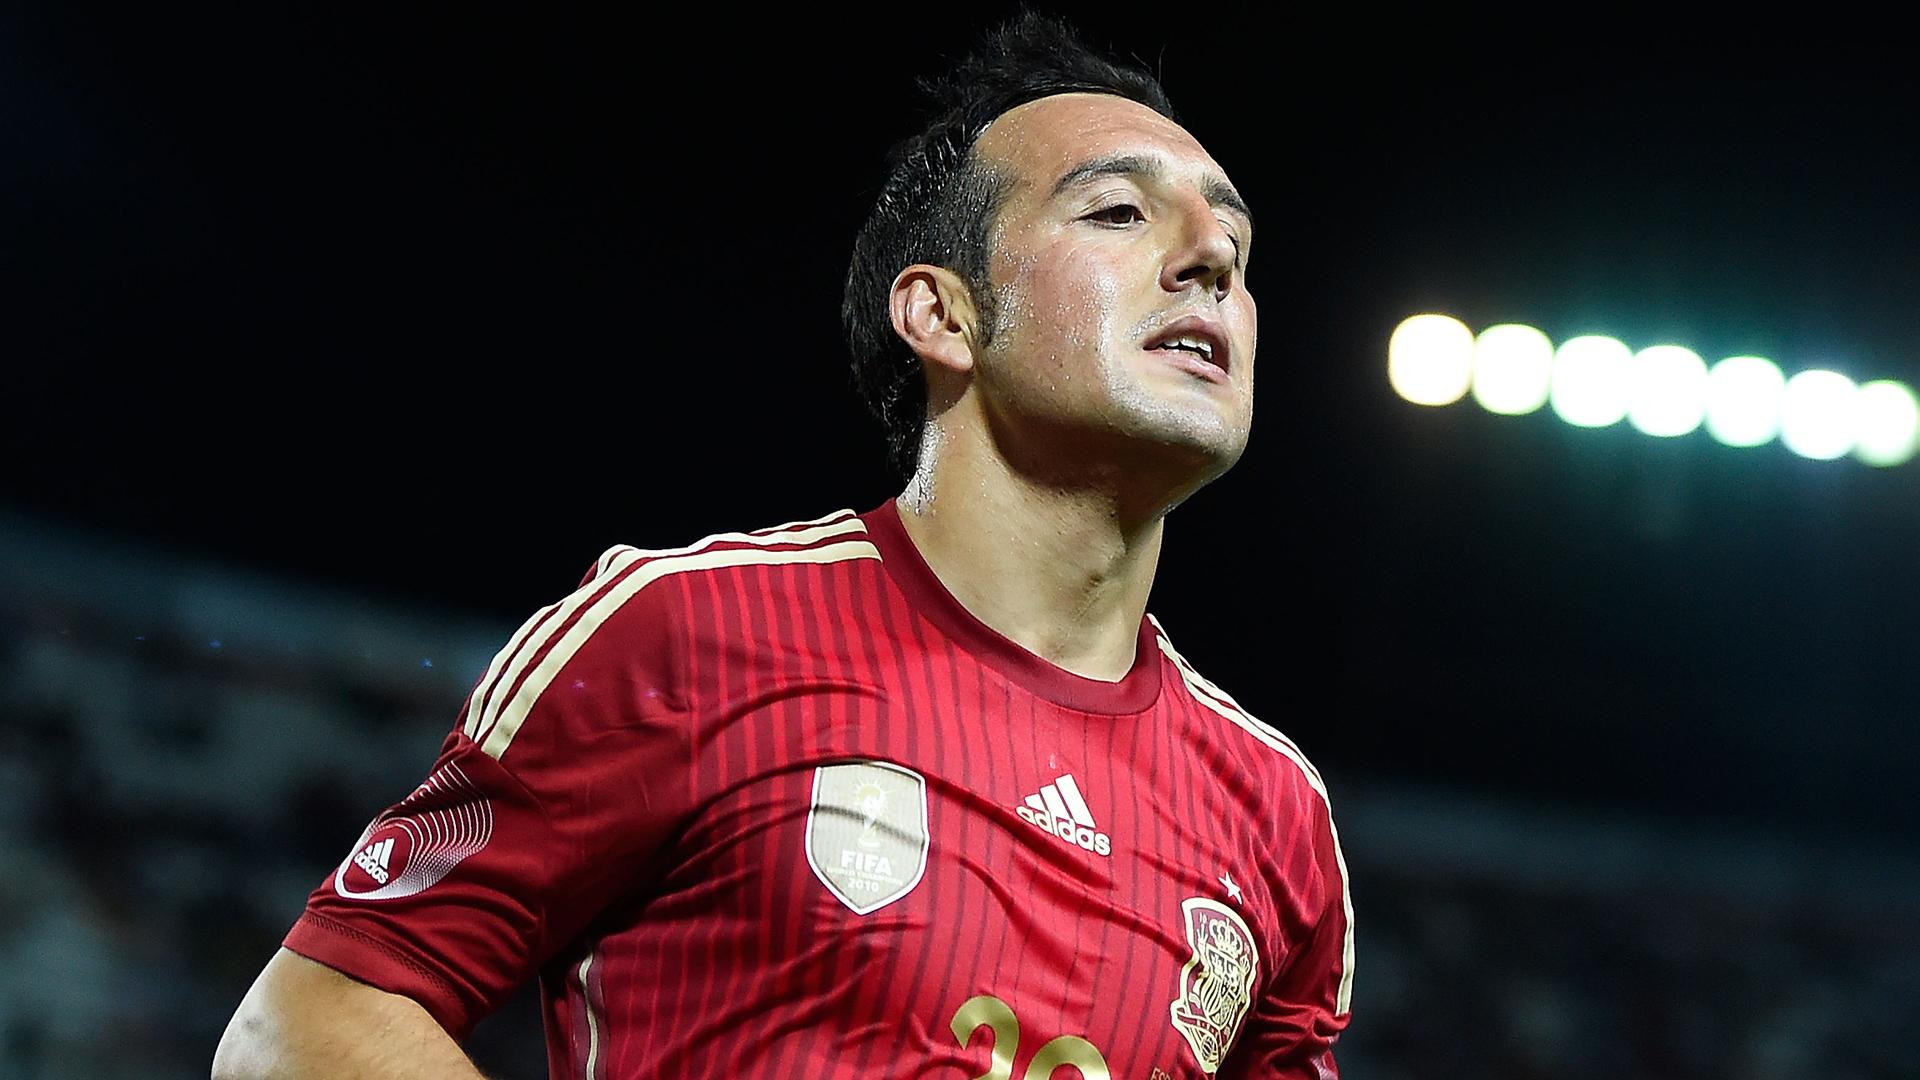 Villarreal midfielder Santi Cazorla stunned by Spain recall